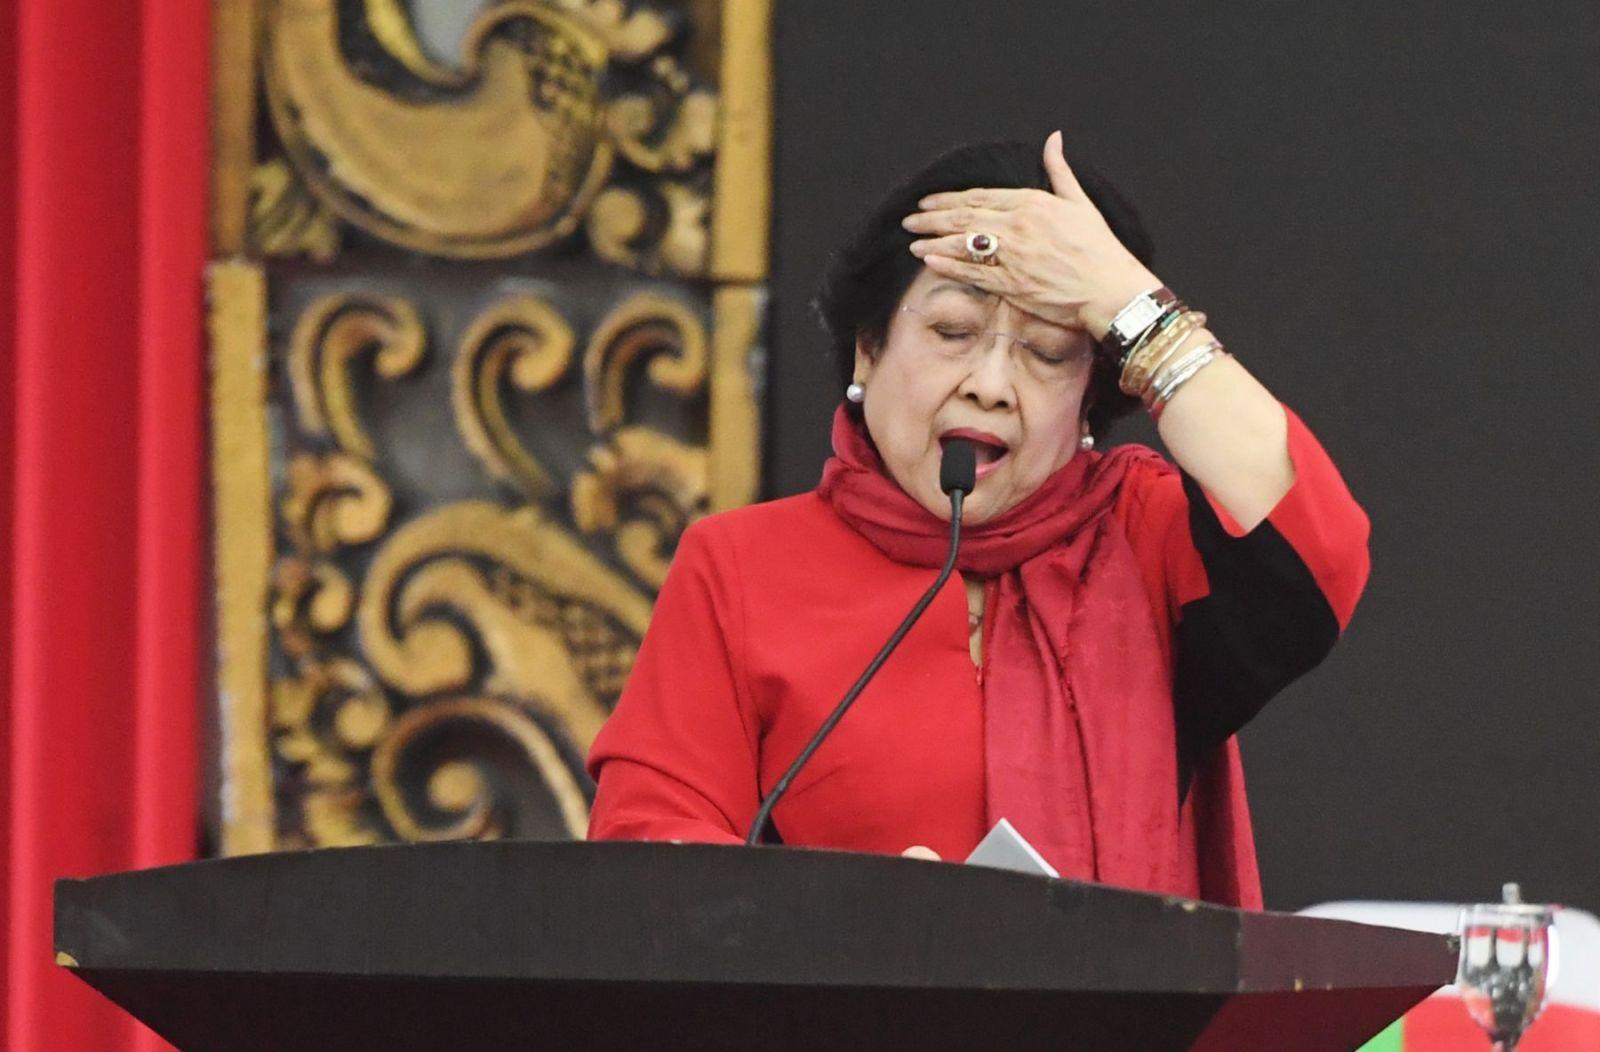 Ketum PDIP, Megawati Soekarnoputri. Foto: ANTARA/Akbar Nugroho